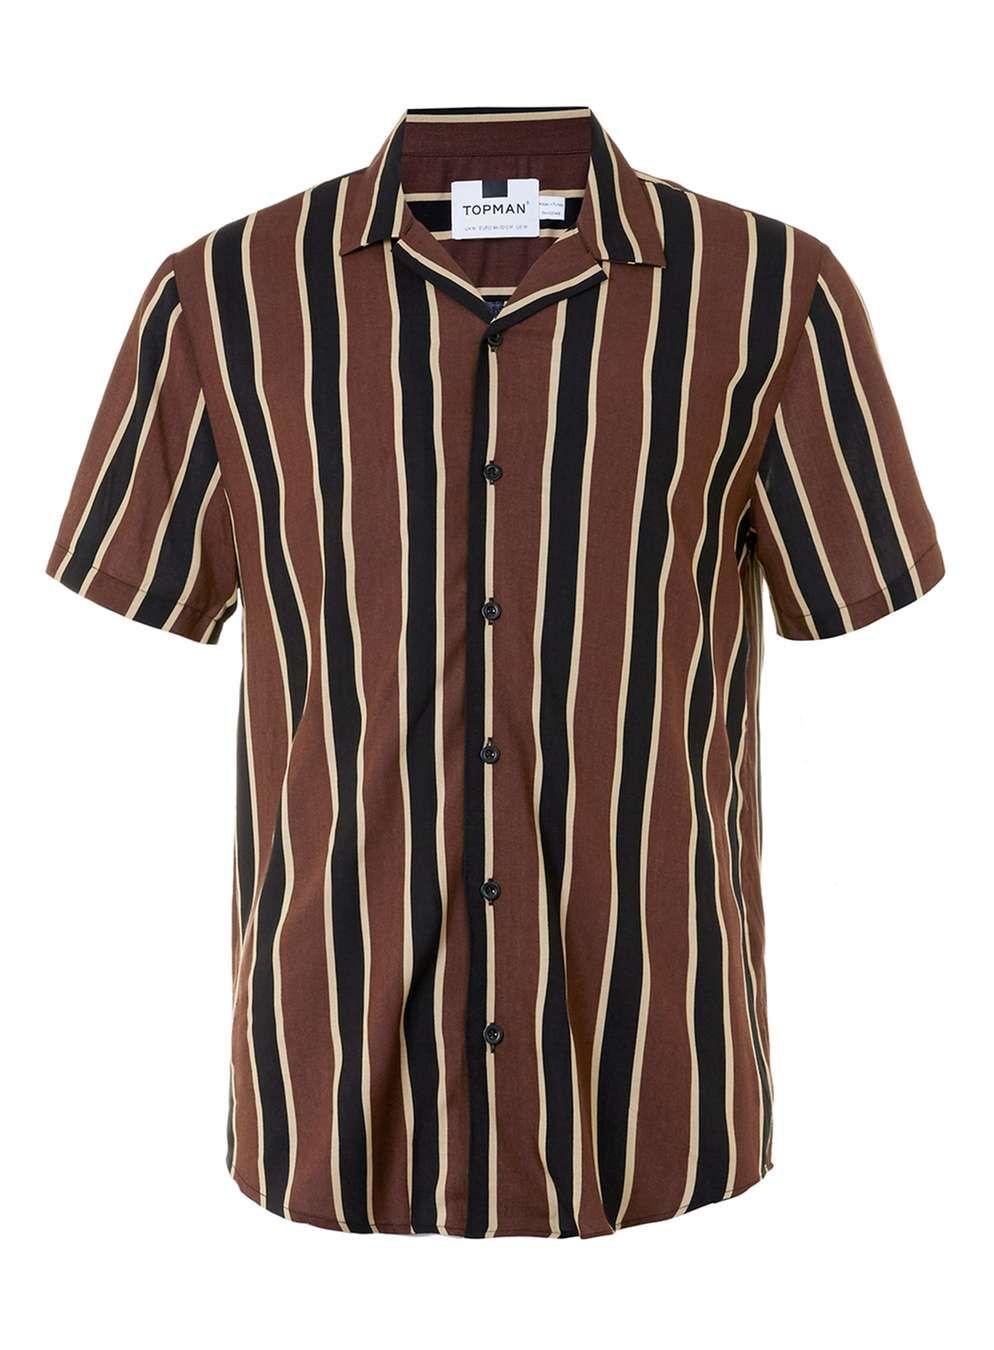 USA Men Striped Short Sleeves Casual Popular Stripe Cotton Short Sleeve T-Shirt